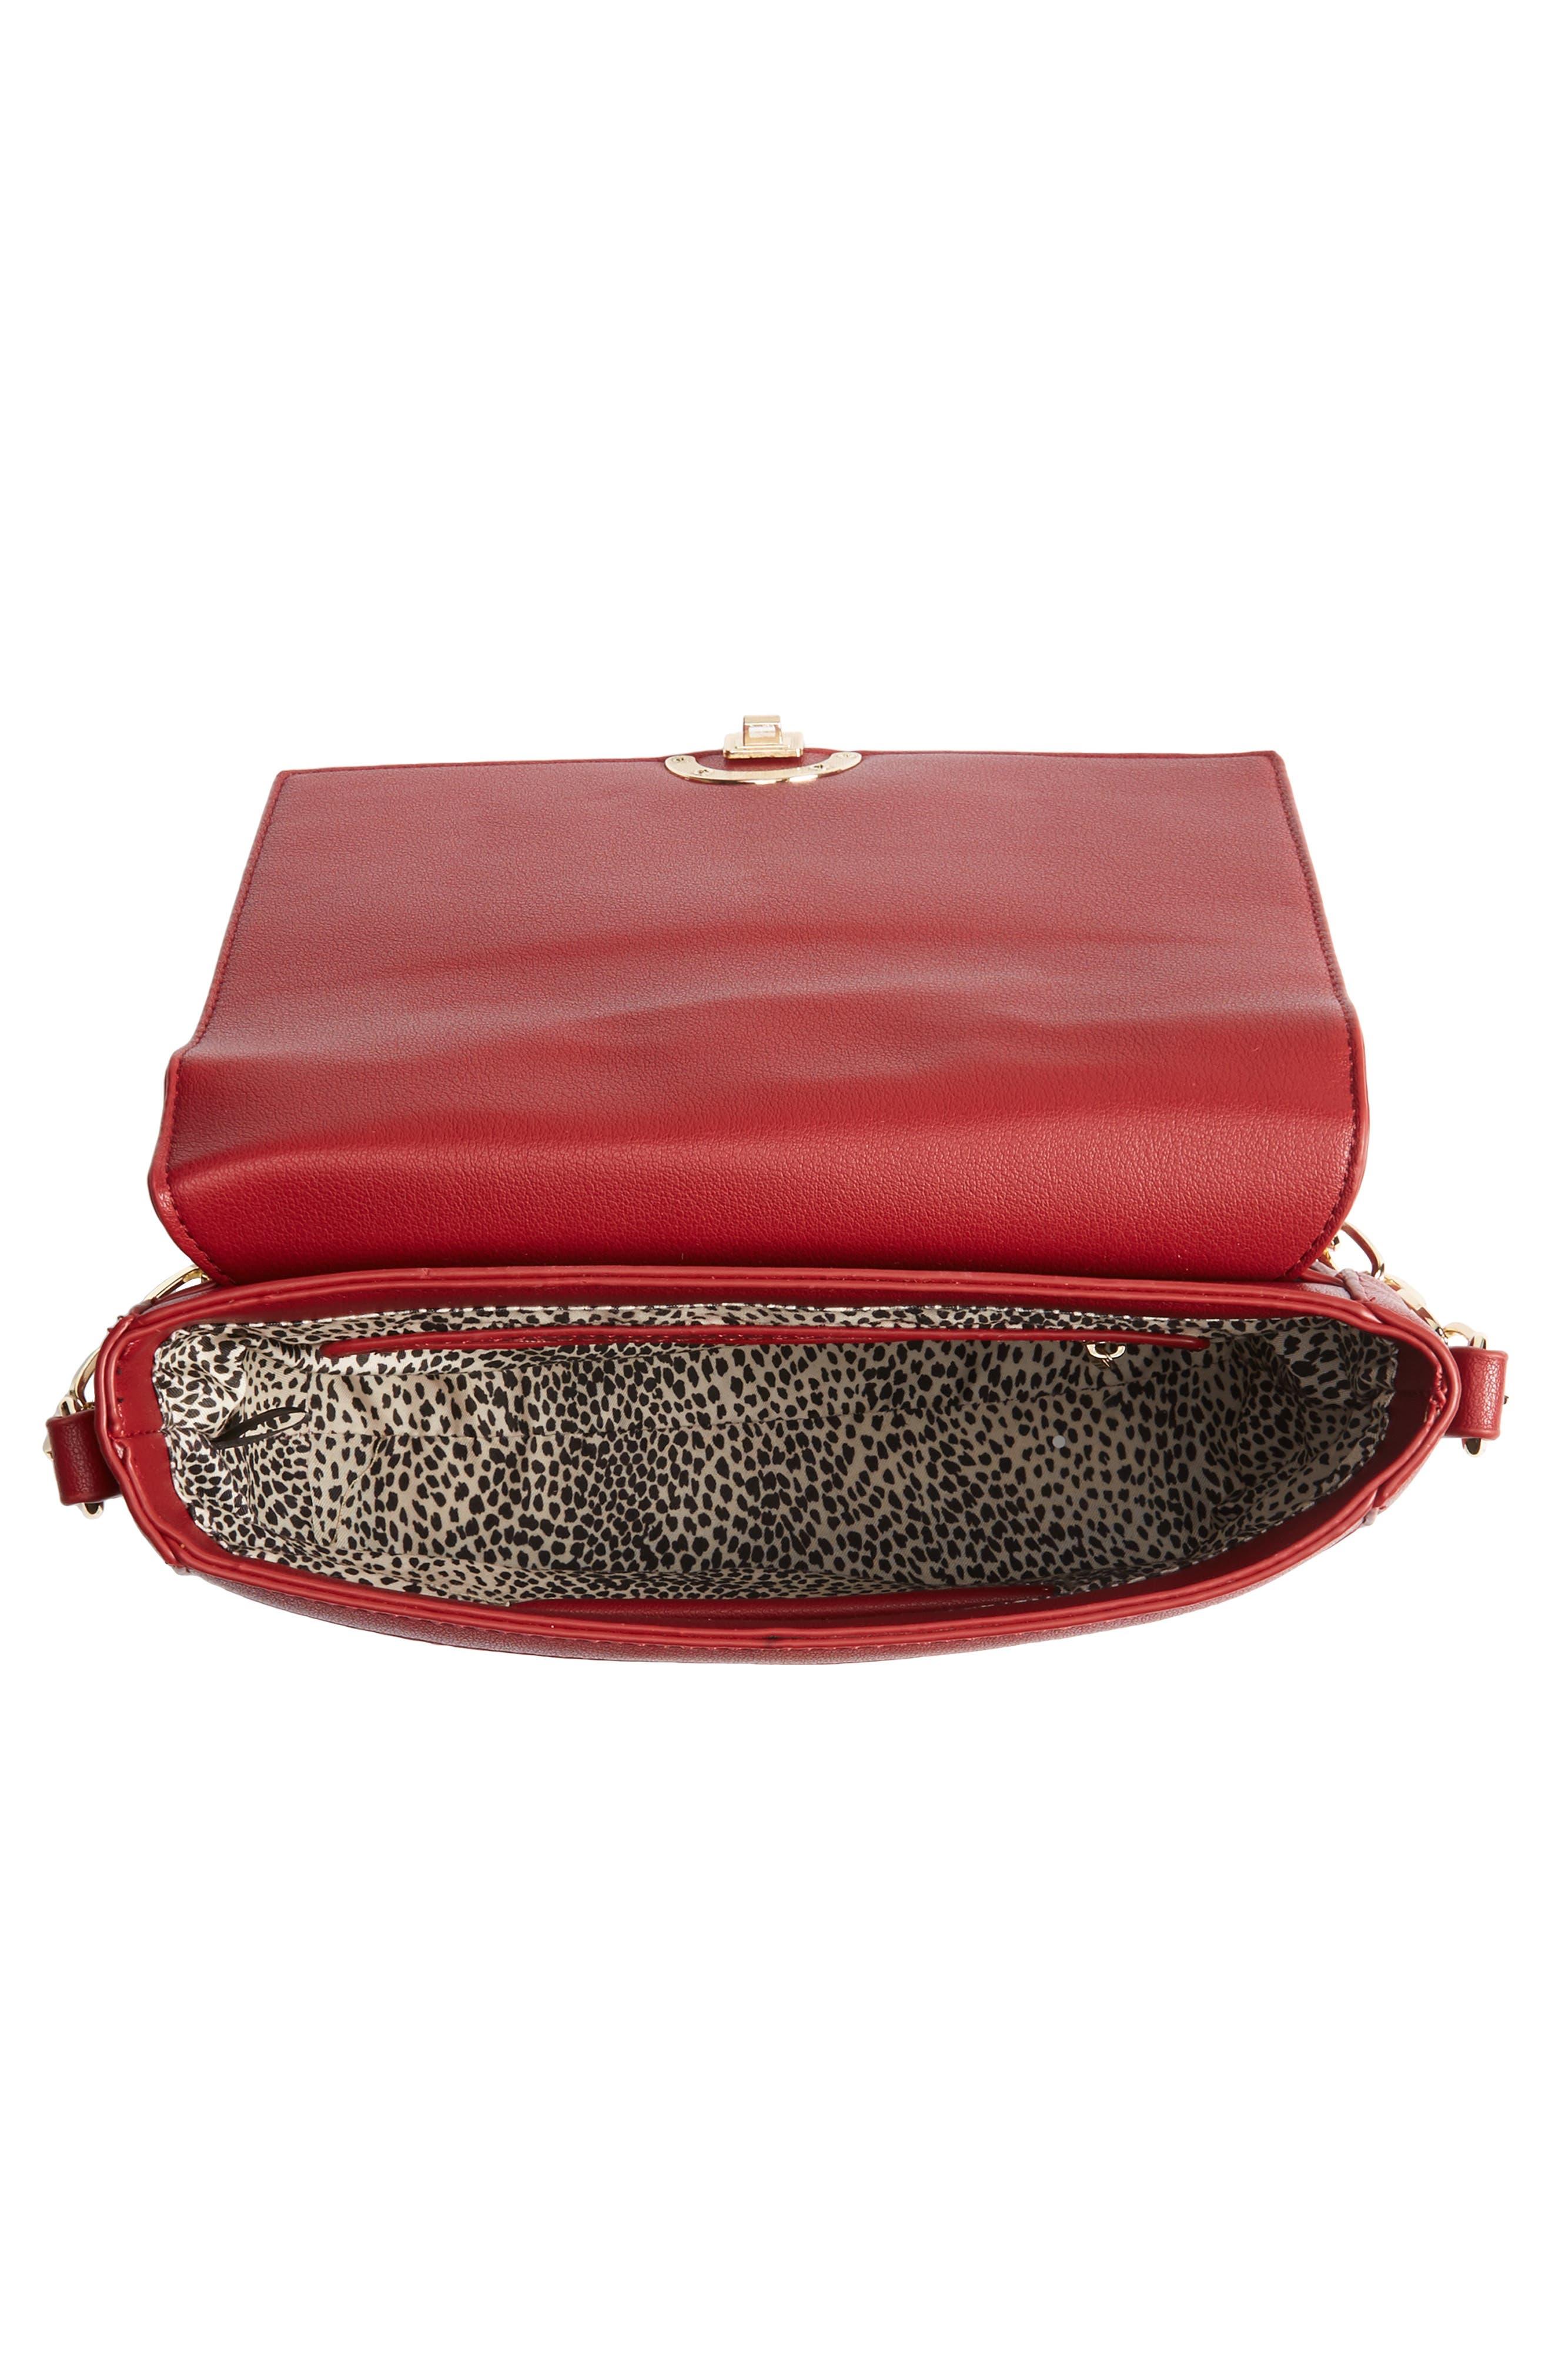 Colie Faux Leather Crossbody Bag,                             Alternate thumbnail 12, color,